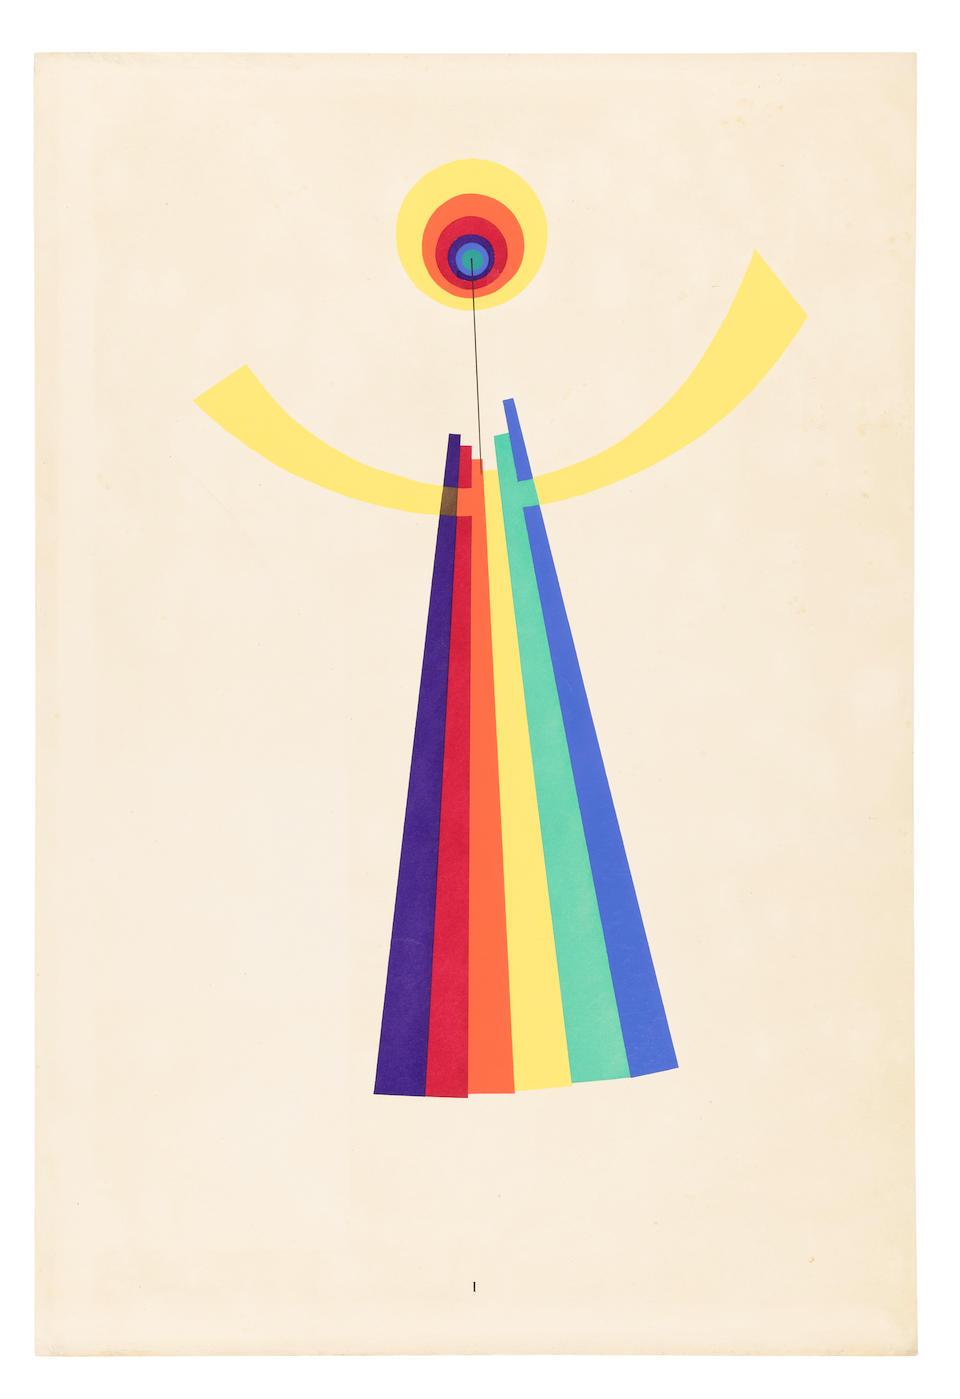 MAN RAY. 1890-1976. Revolving Doors, 1916-1917.    Paris: Editions Surrealistes, 1926.